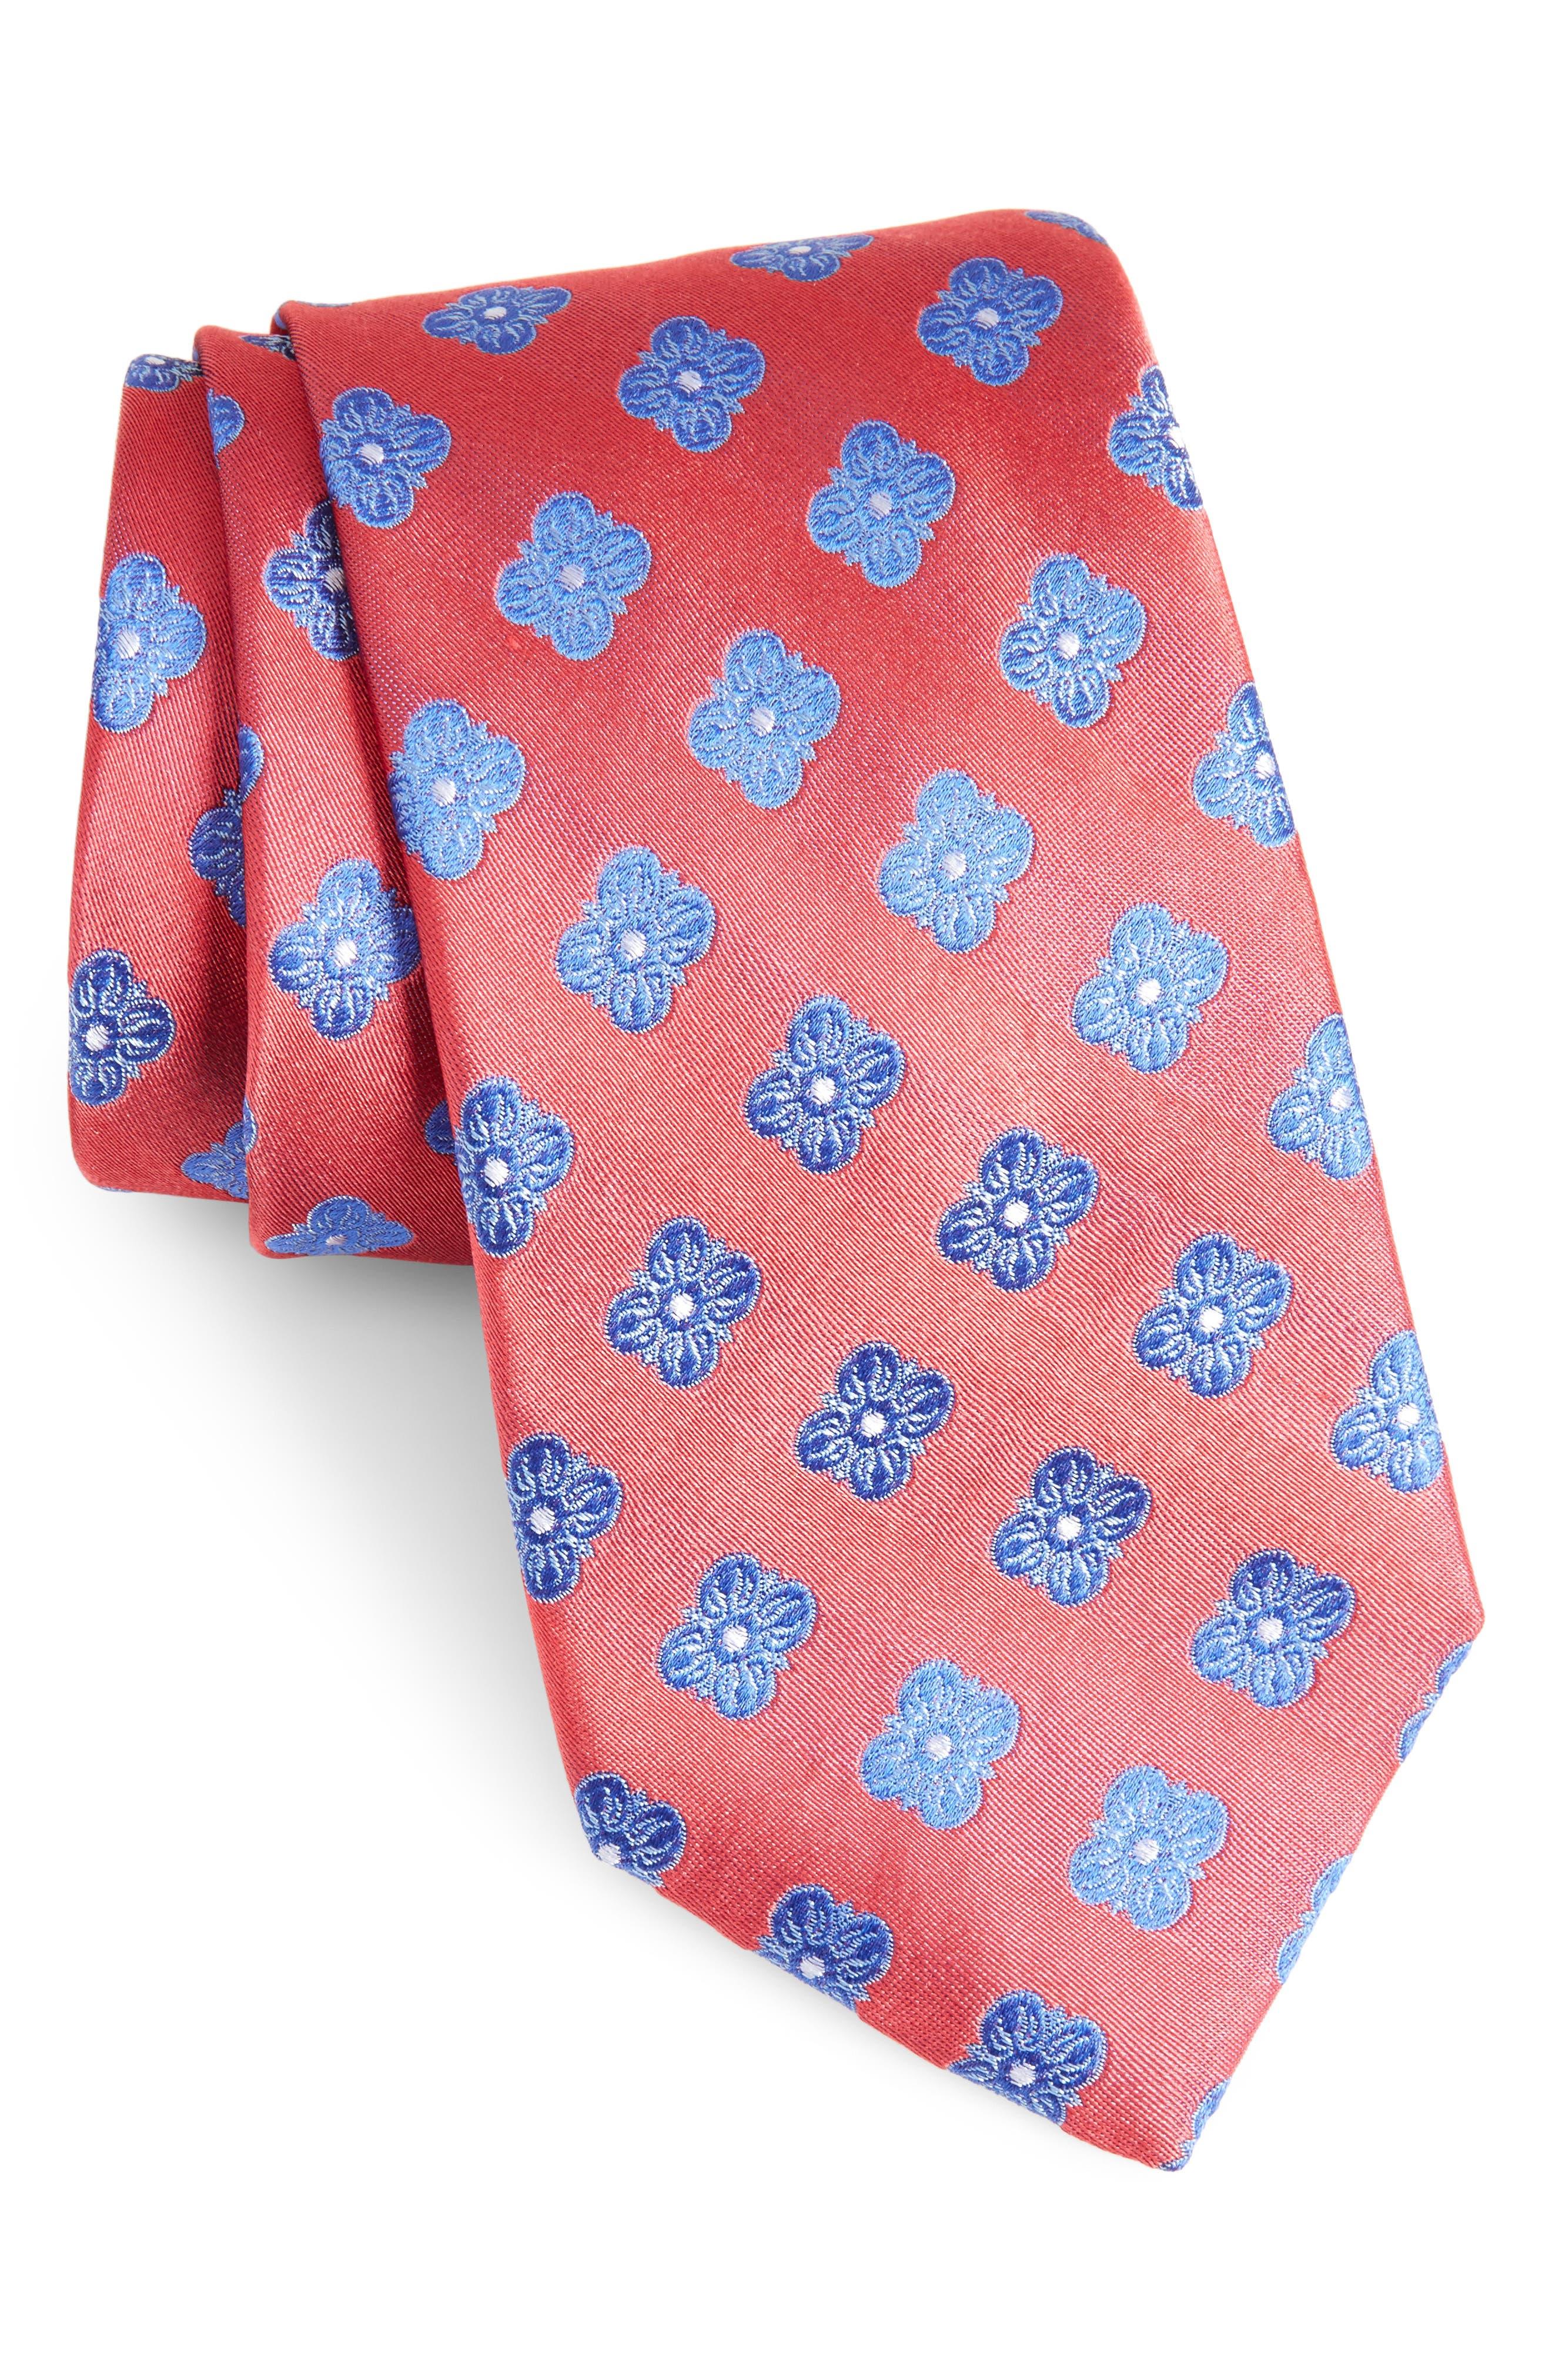 Cameron Floral Medallion Silk Tie,                             Main thumbnail 1, color,                             610